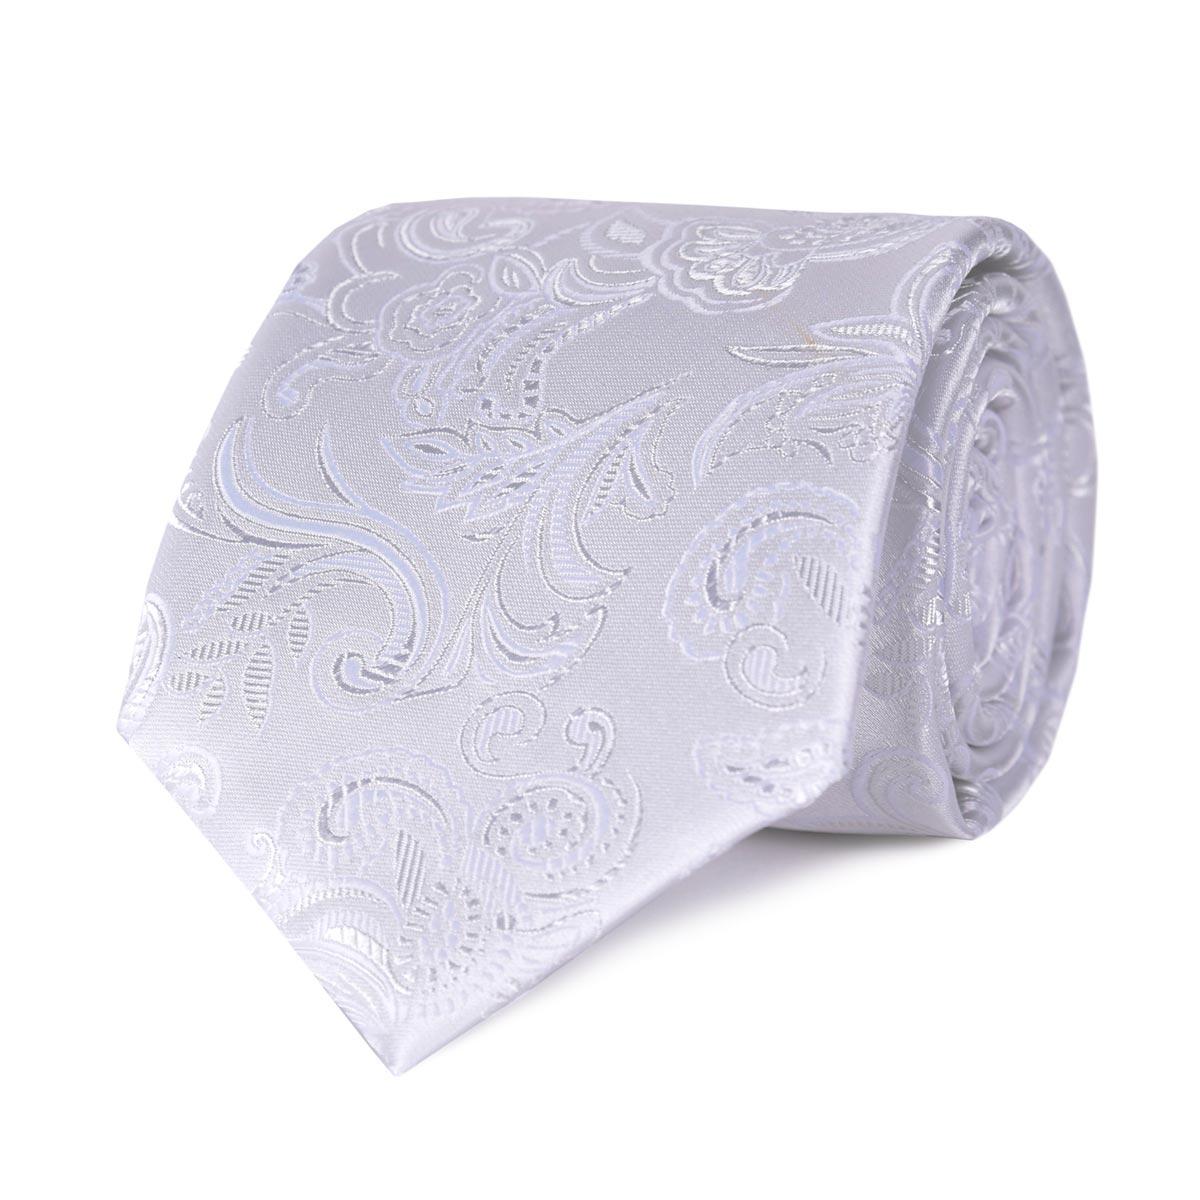 _Cravate-motif-arabesque-gris-argent